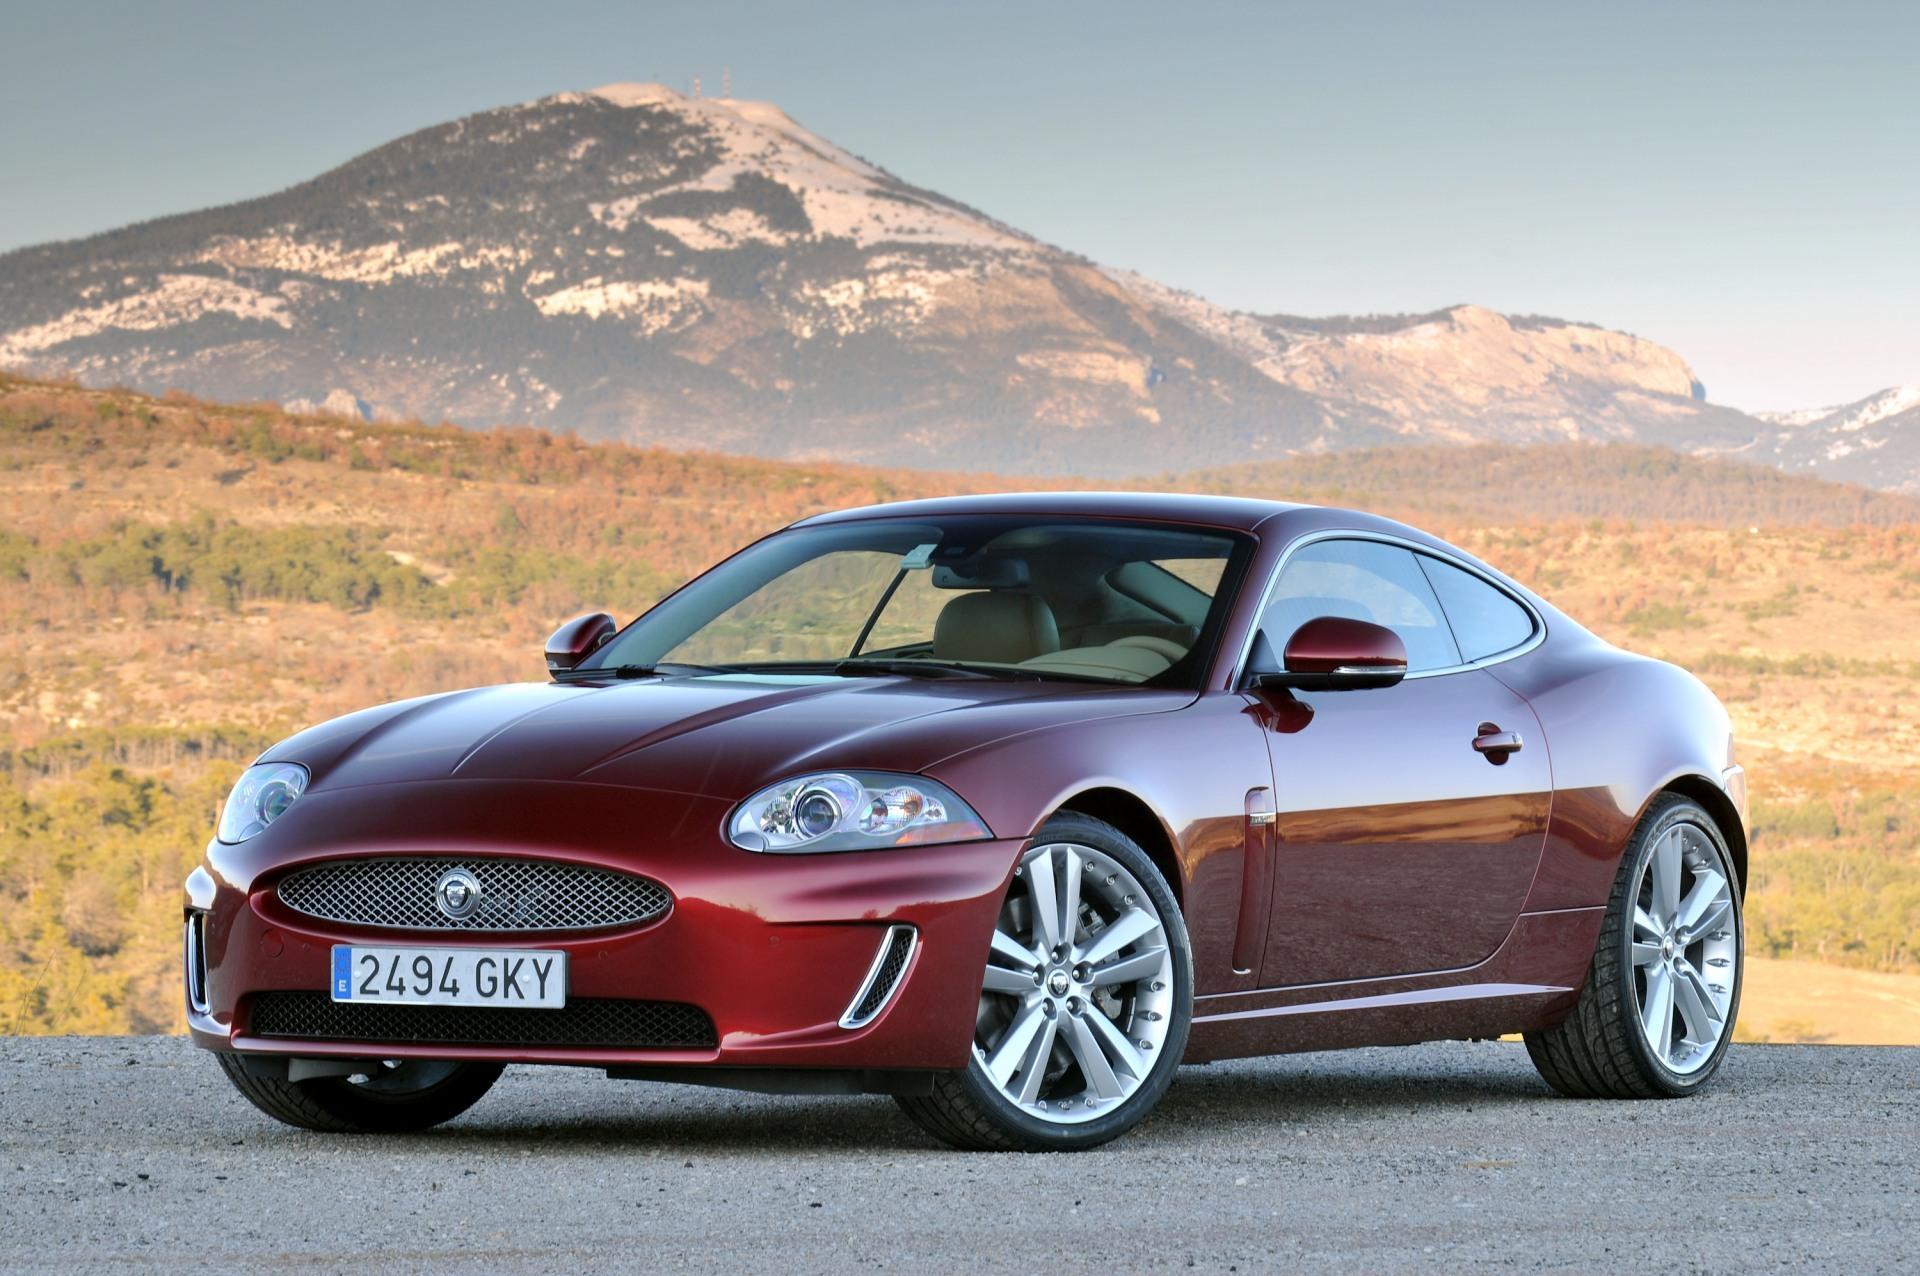 2011 Jaguar Xk News And Information Conceptcarz Com